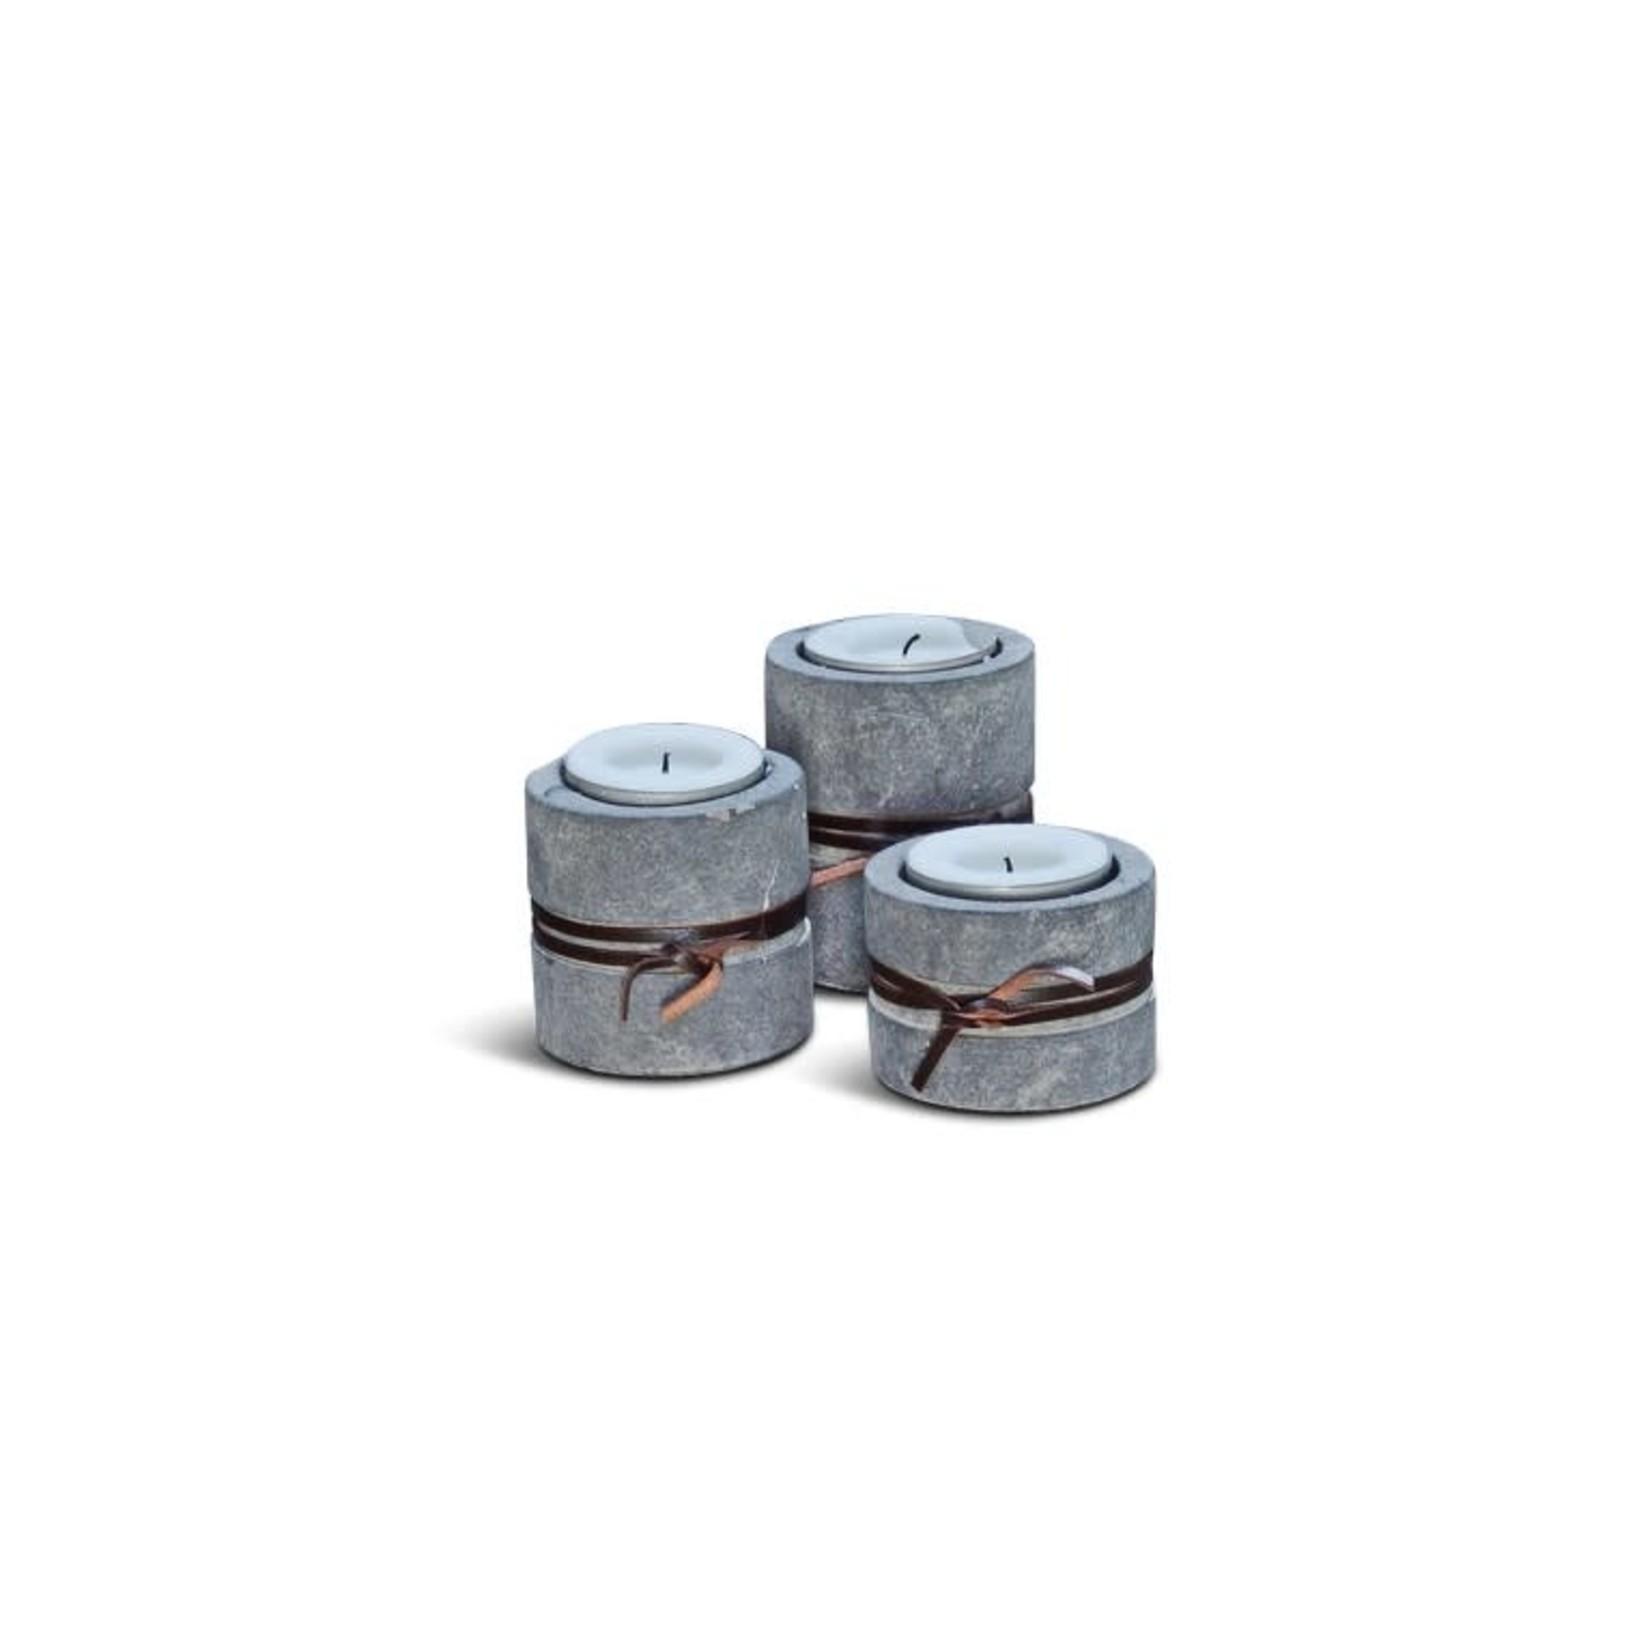 Brynxz Brynxz | Candleholder large (pst)